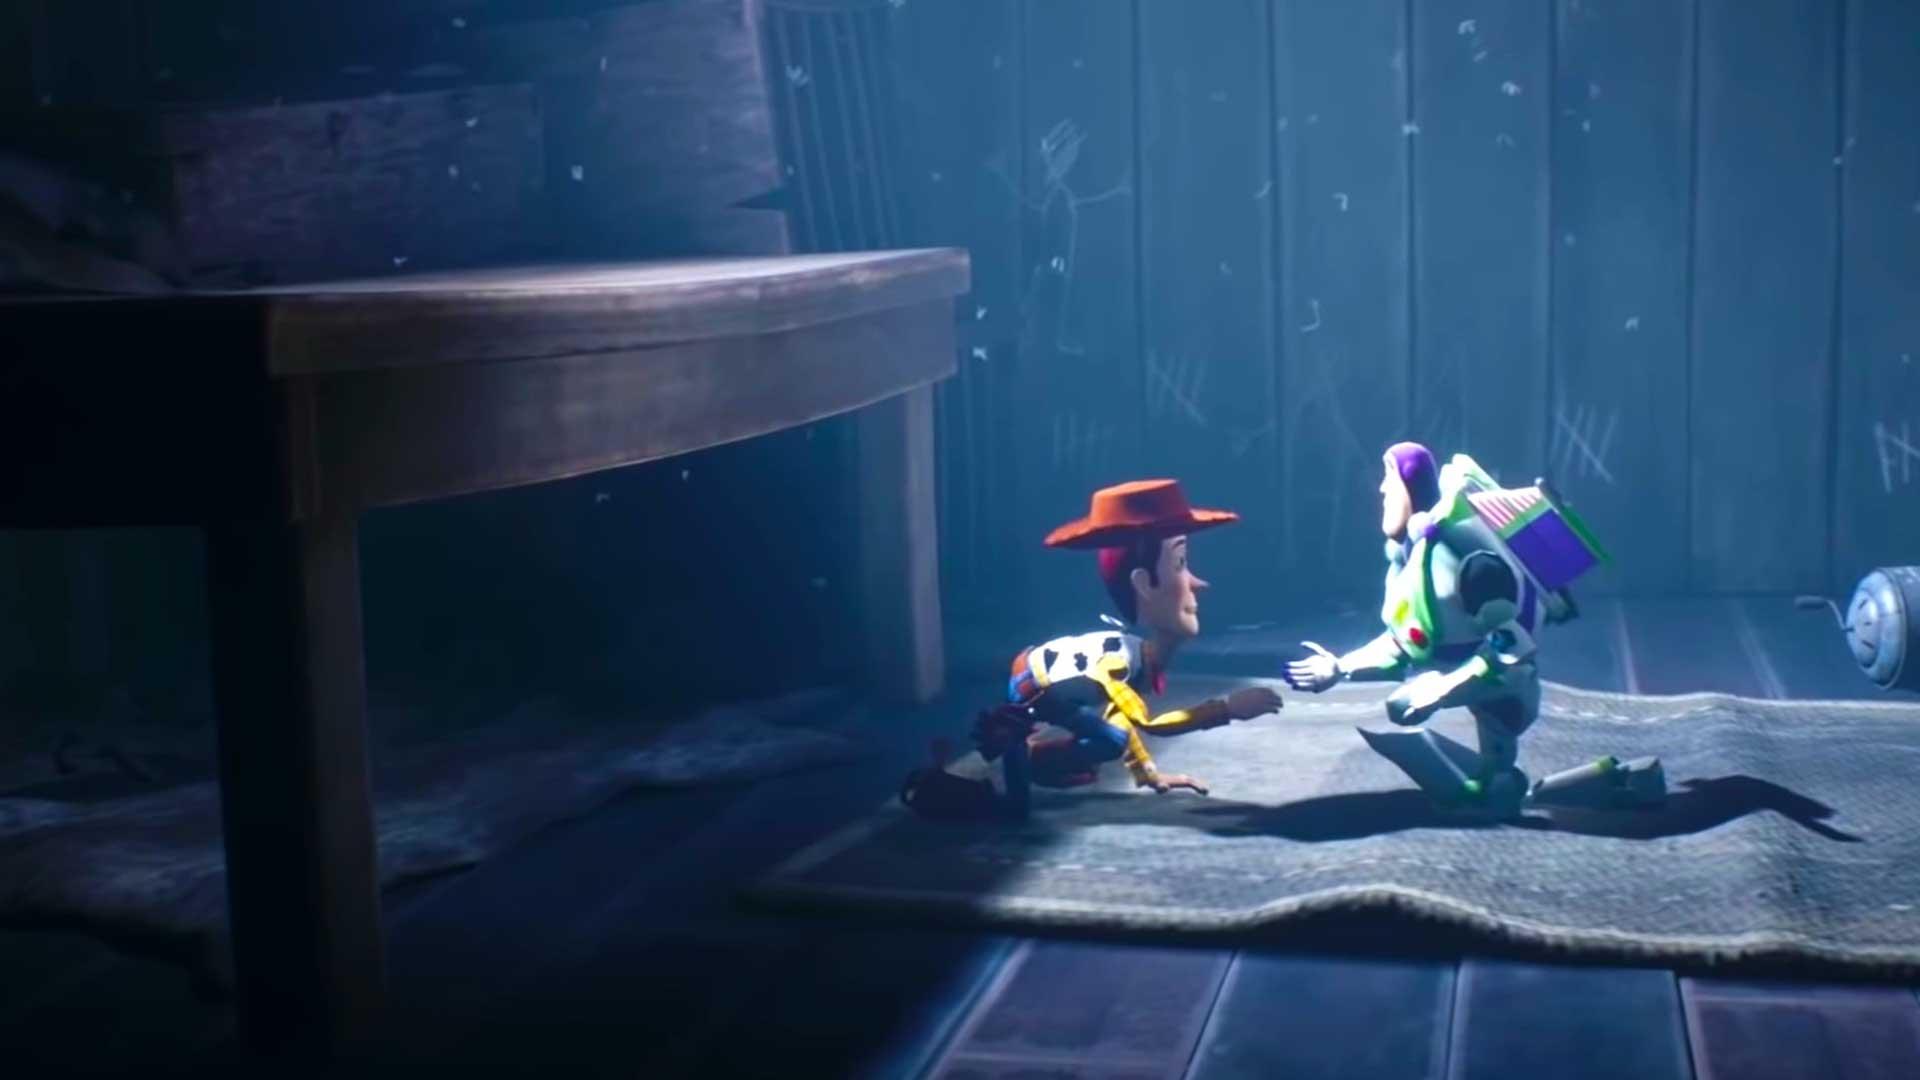 Little Nightmares II Woody Buzz Lightyear Mod